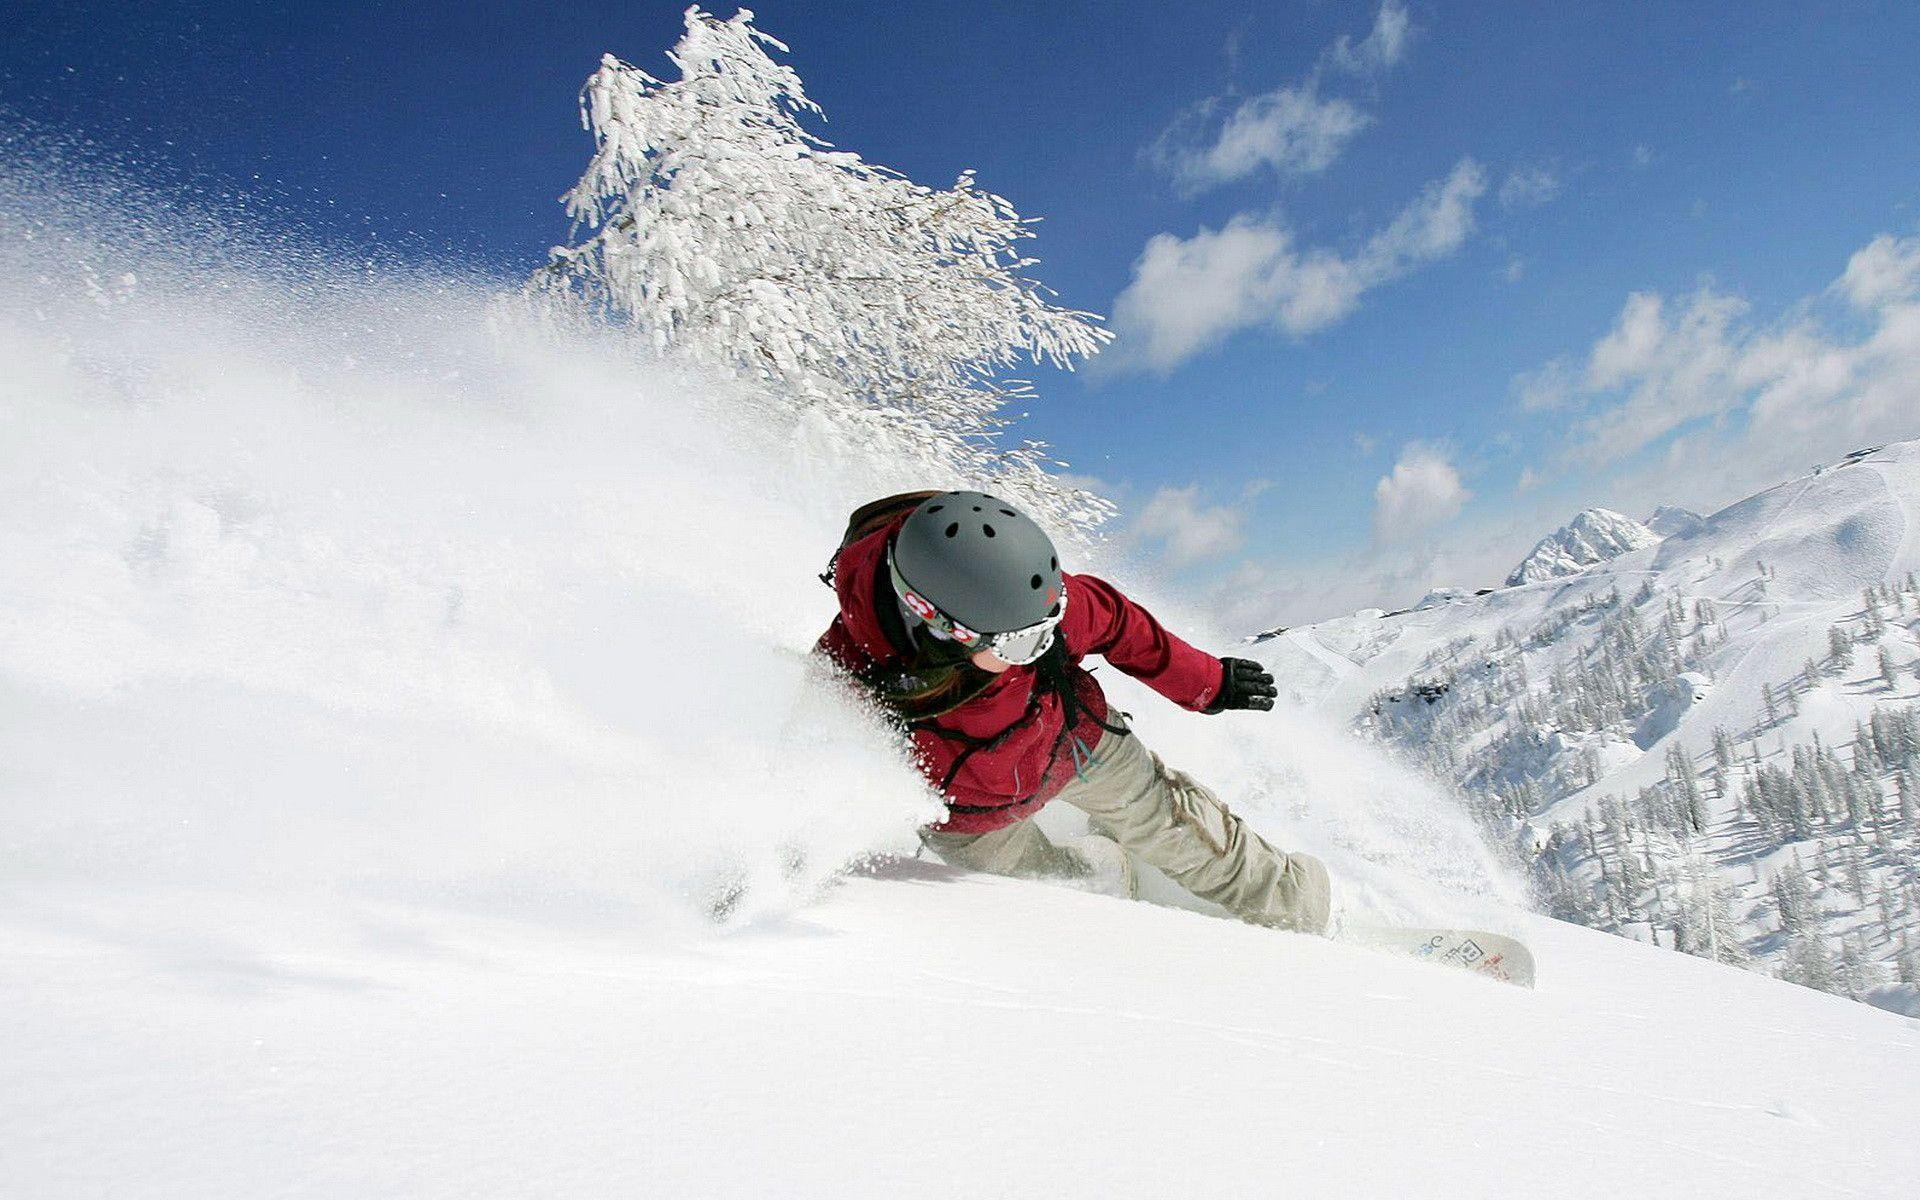 Snowboarding Wallpapers HD - Wallpaper - 293.7KB